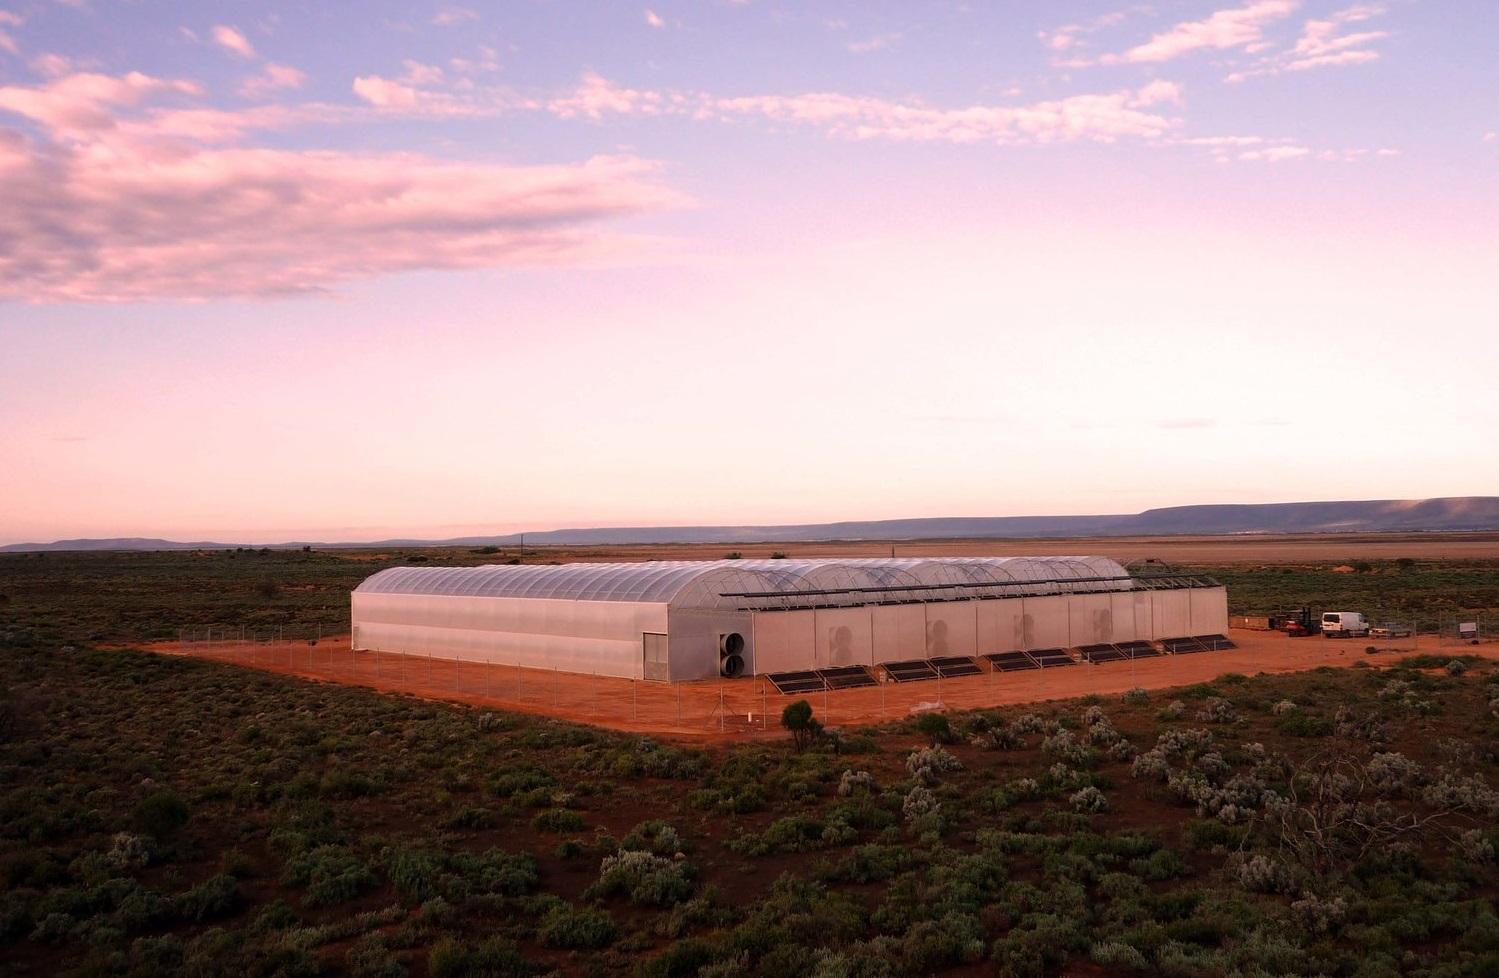 Seawater Greenhouse growing food in the desert